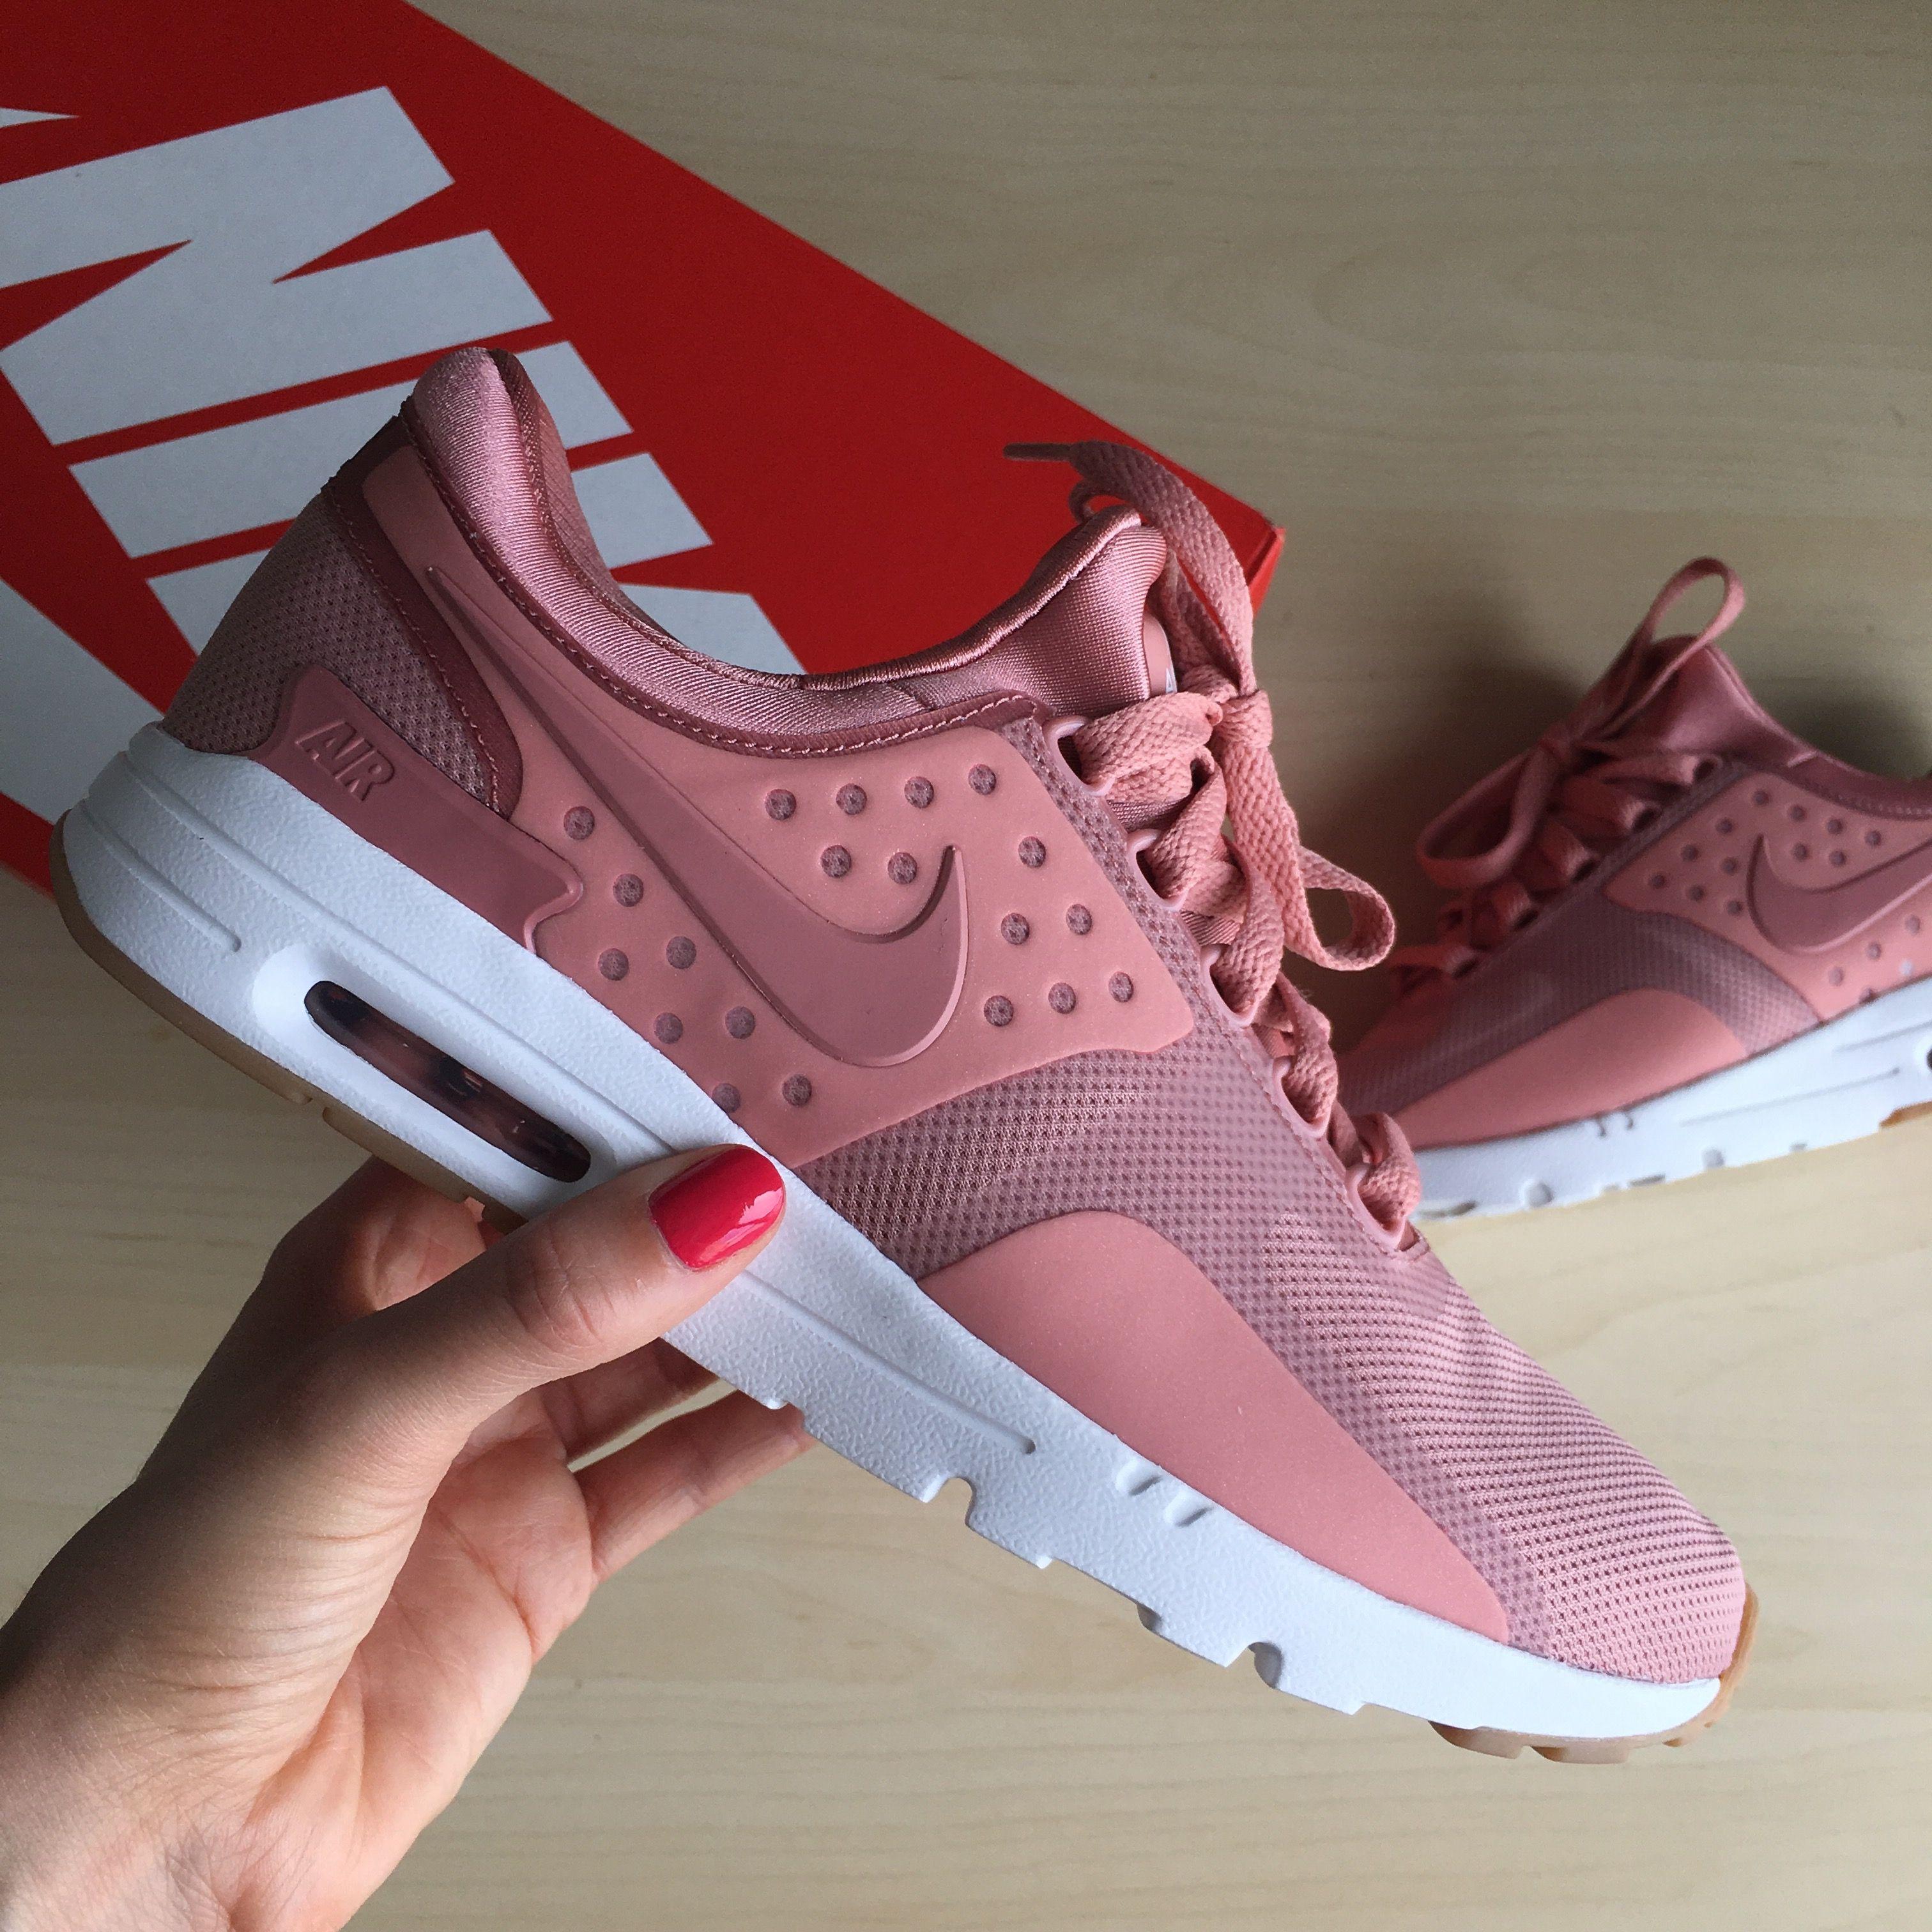 c6422cf85e4a ... red pink Air max zero rouge poussière détoileRed stardust Nike ...